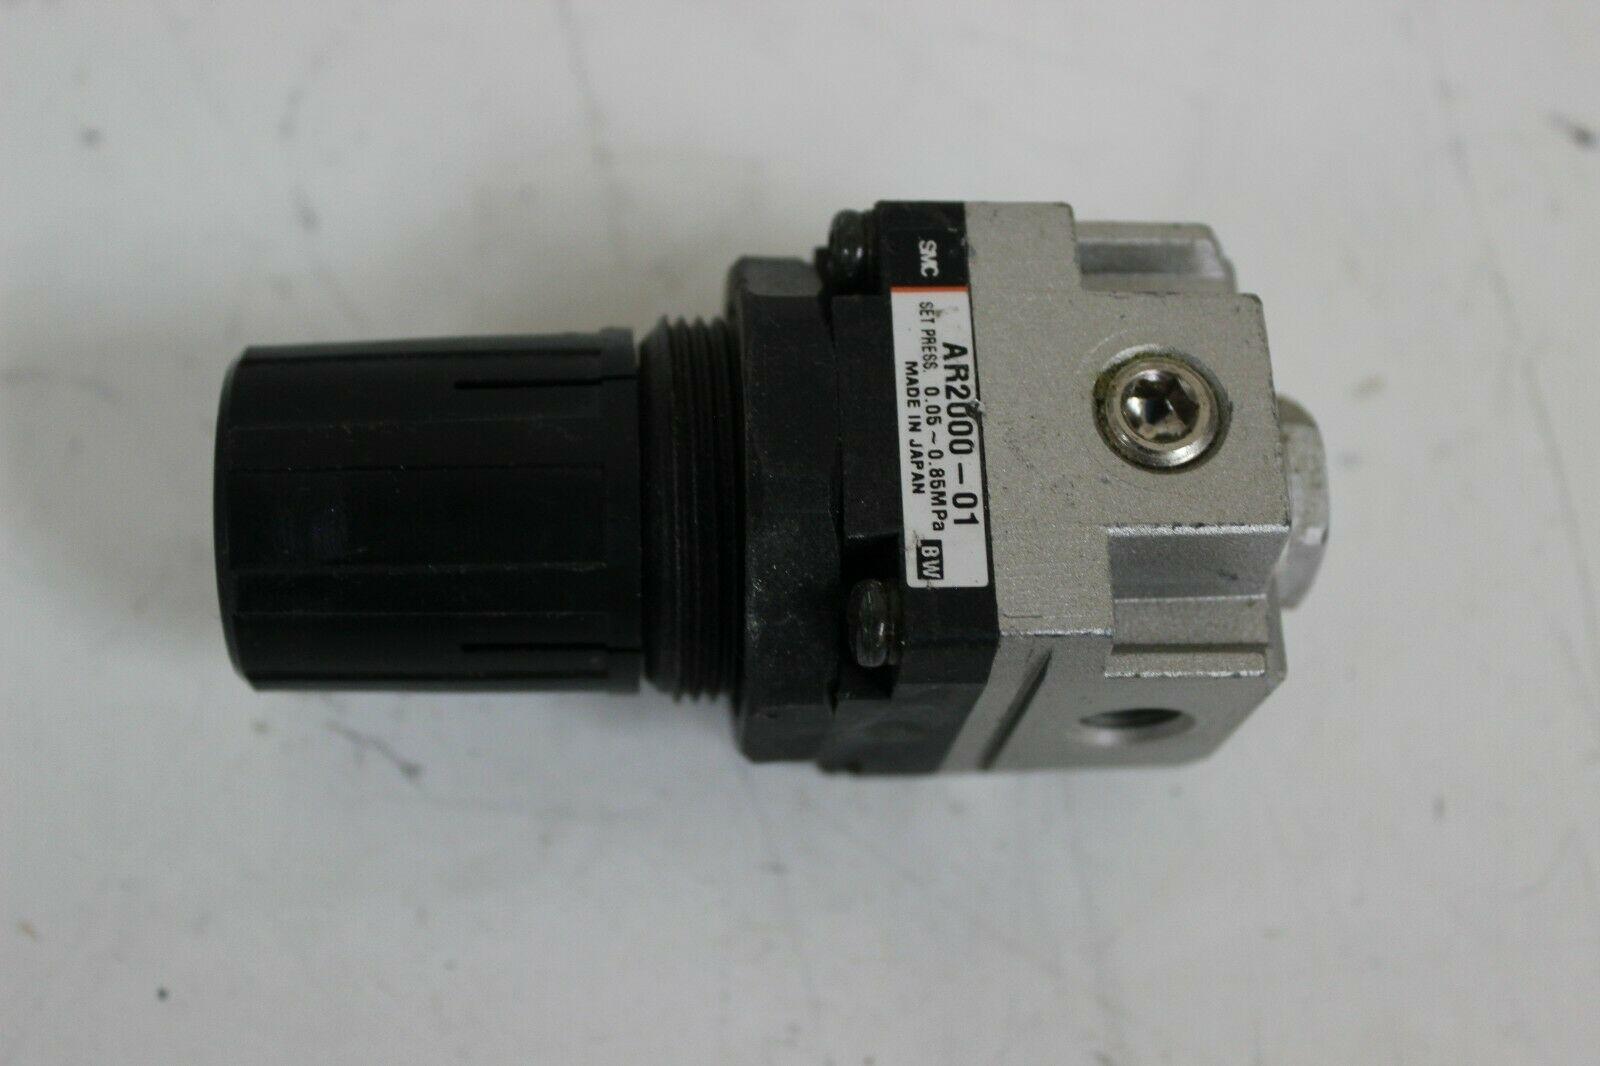 SMC AR2000-01 Modular Air Pressure Regulator Set Press 0.05-085Mpa Port size 1/4